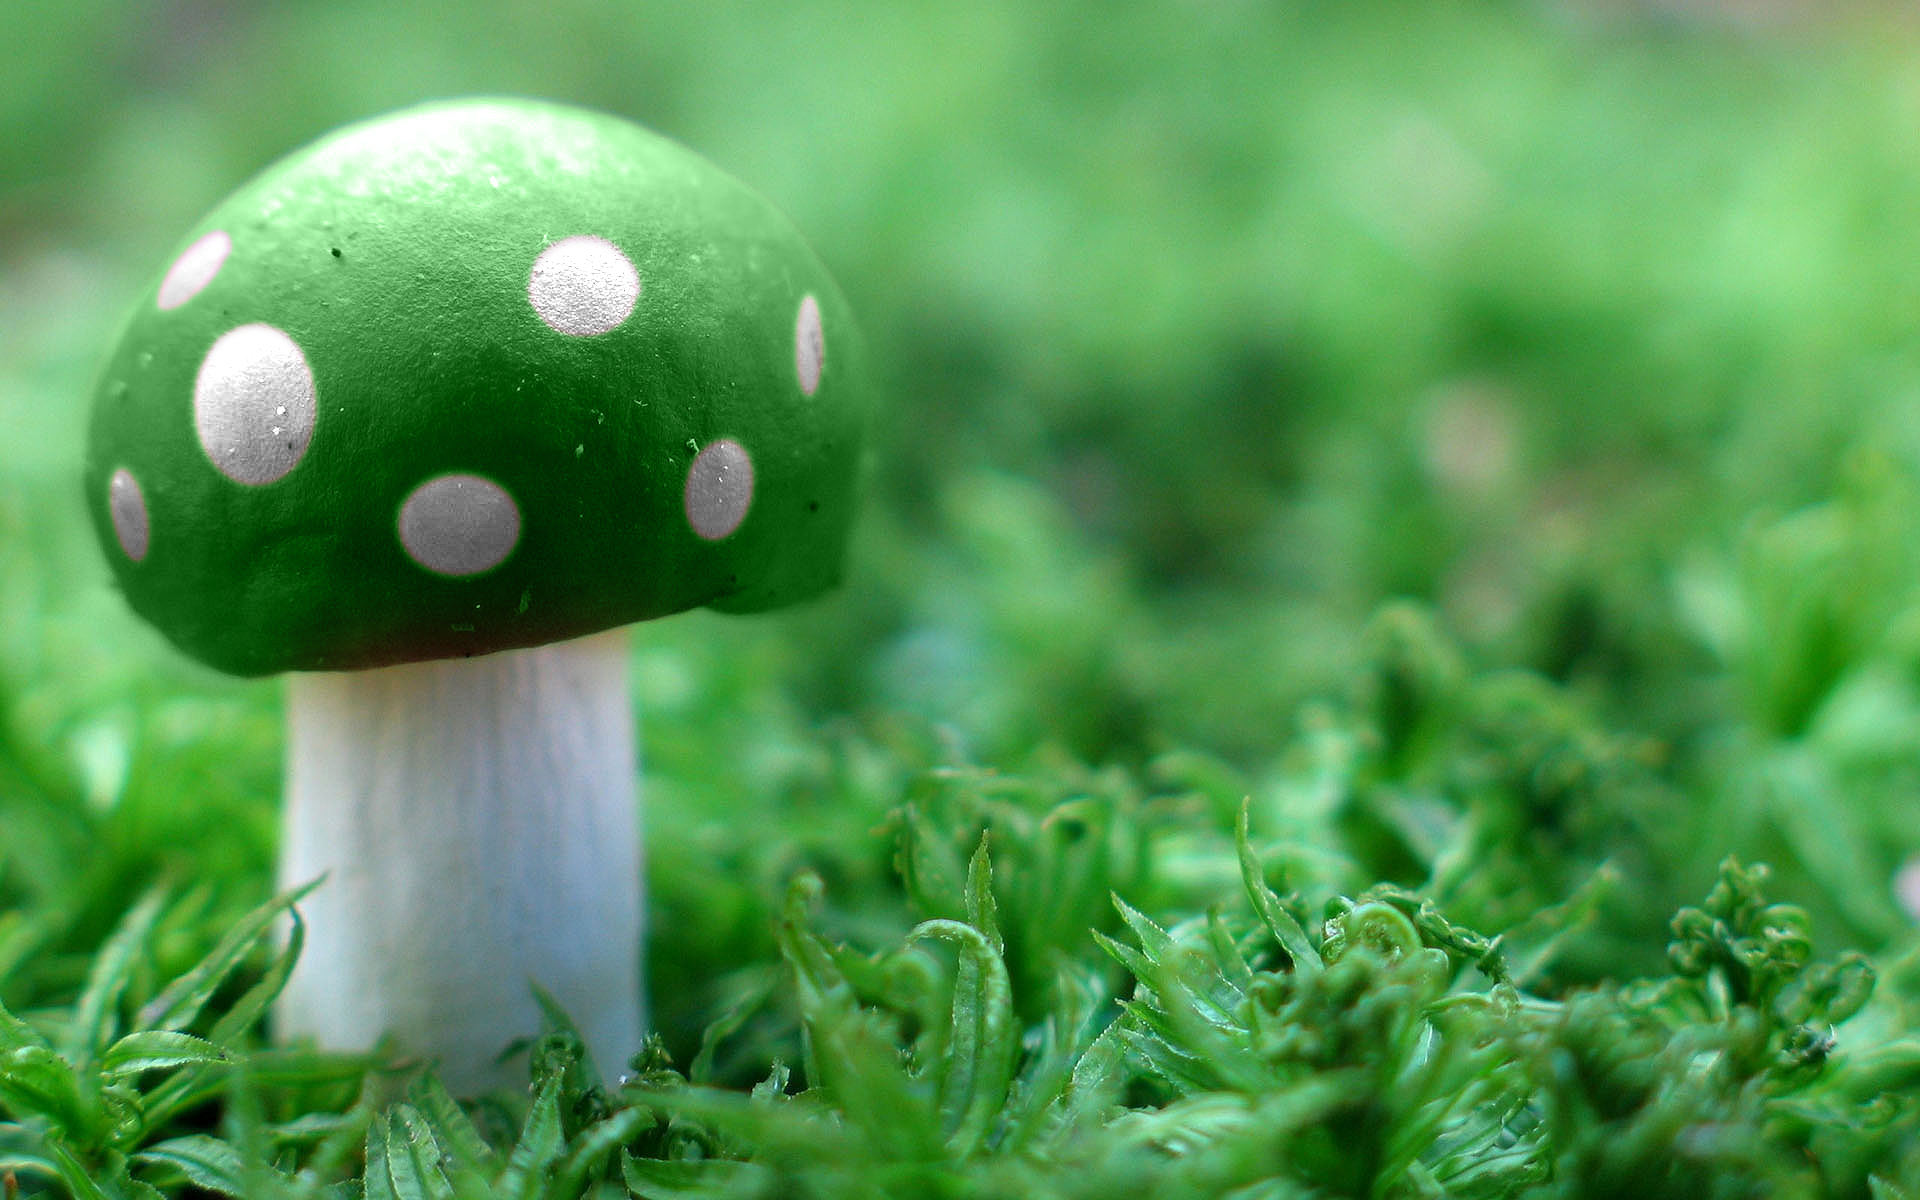 Green Mushroom Wide Wallpapers HD Wallpapers 1920x1200